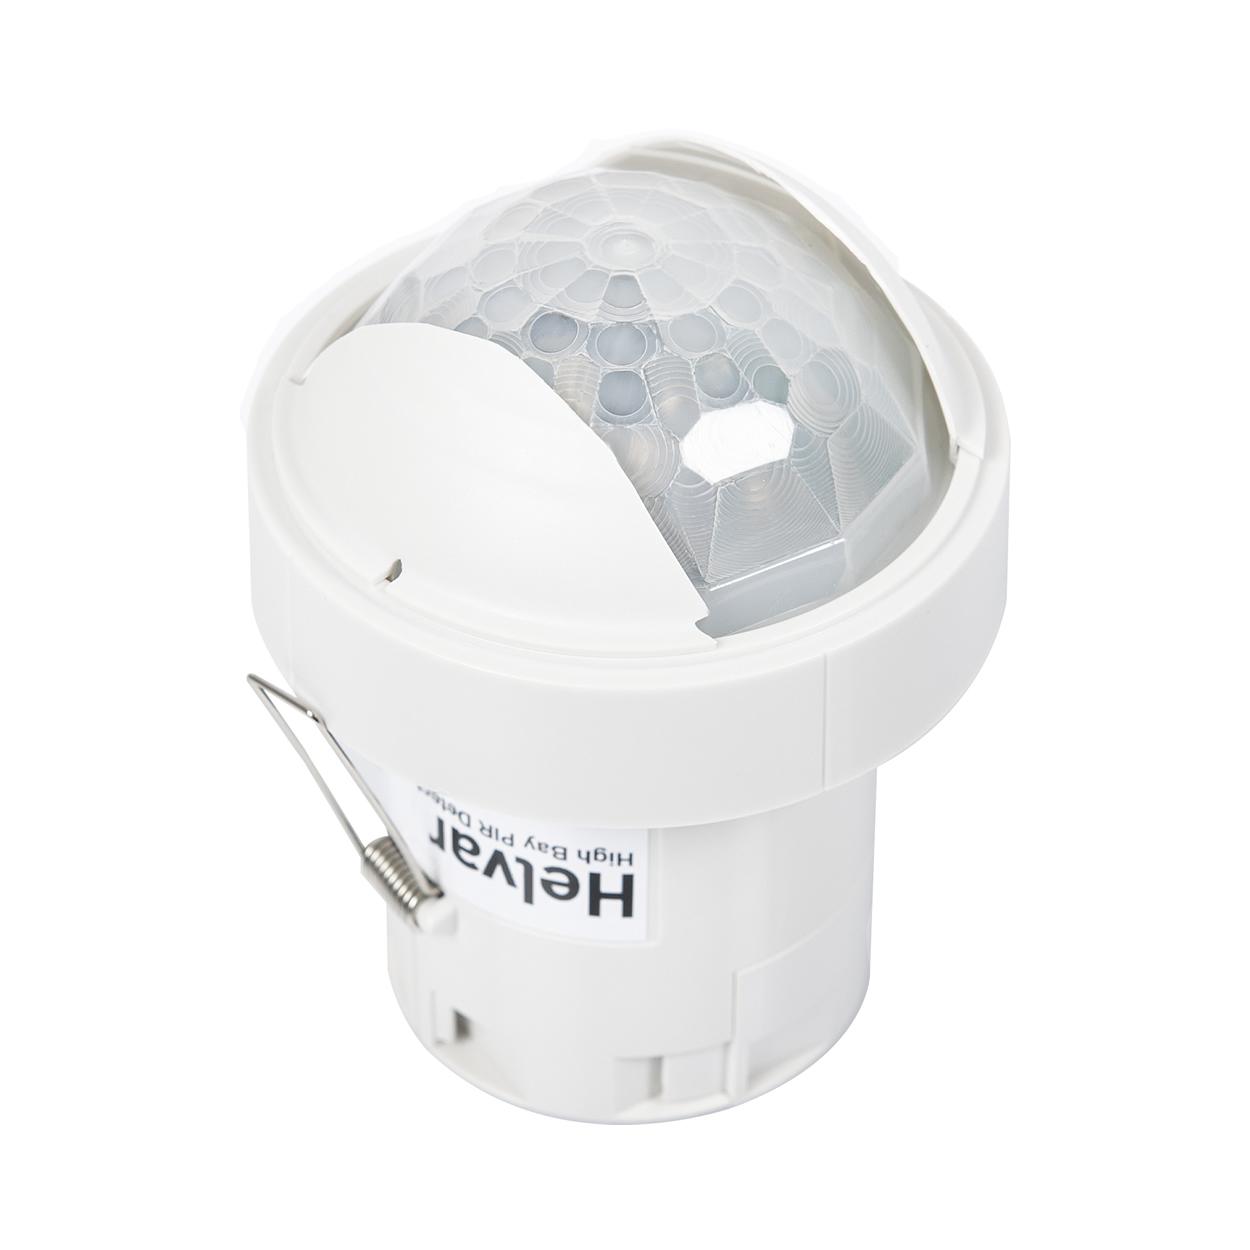 Helvar High Bay PIR Presence/Absence Detector (317)